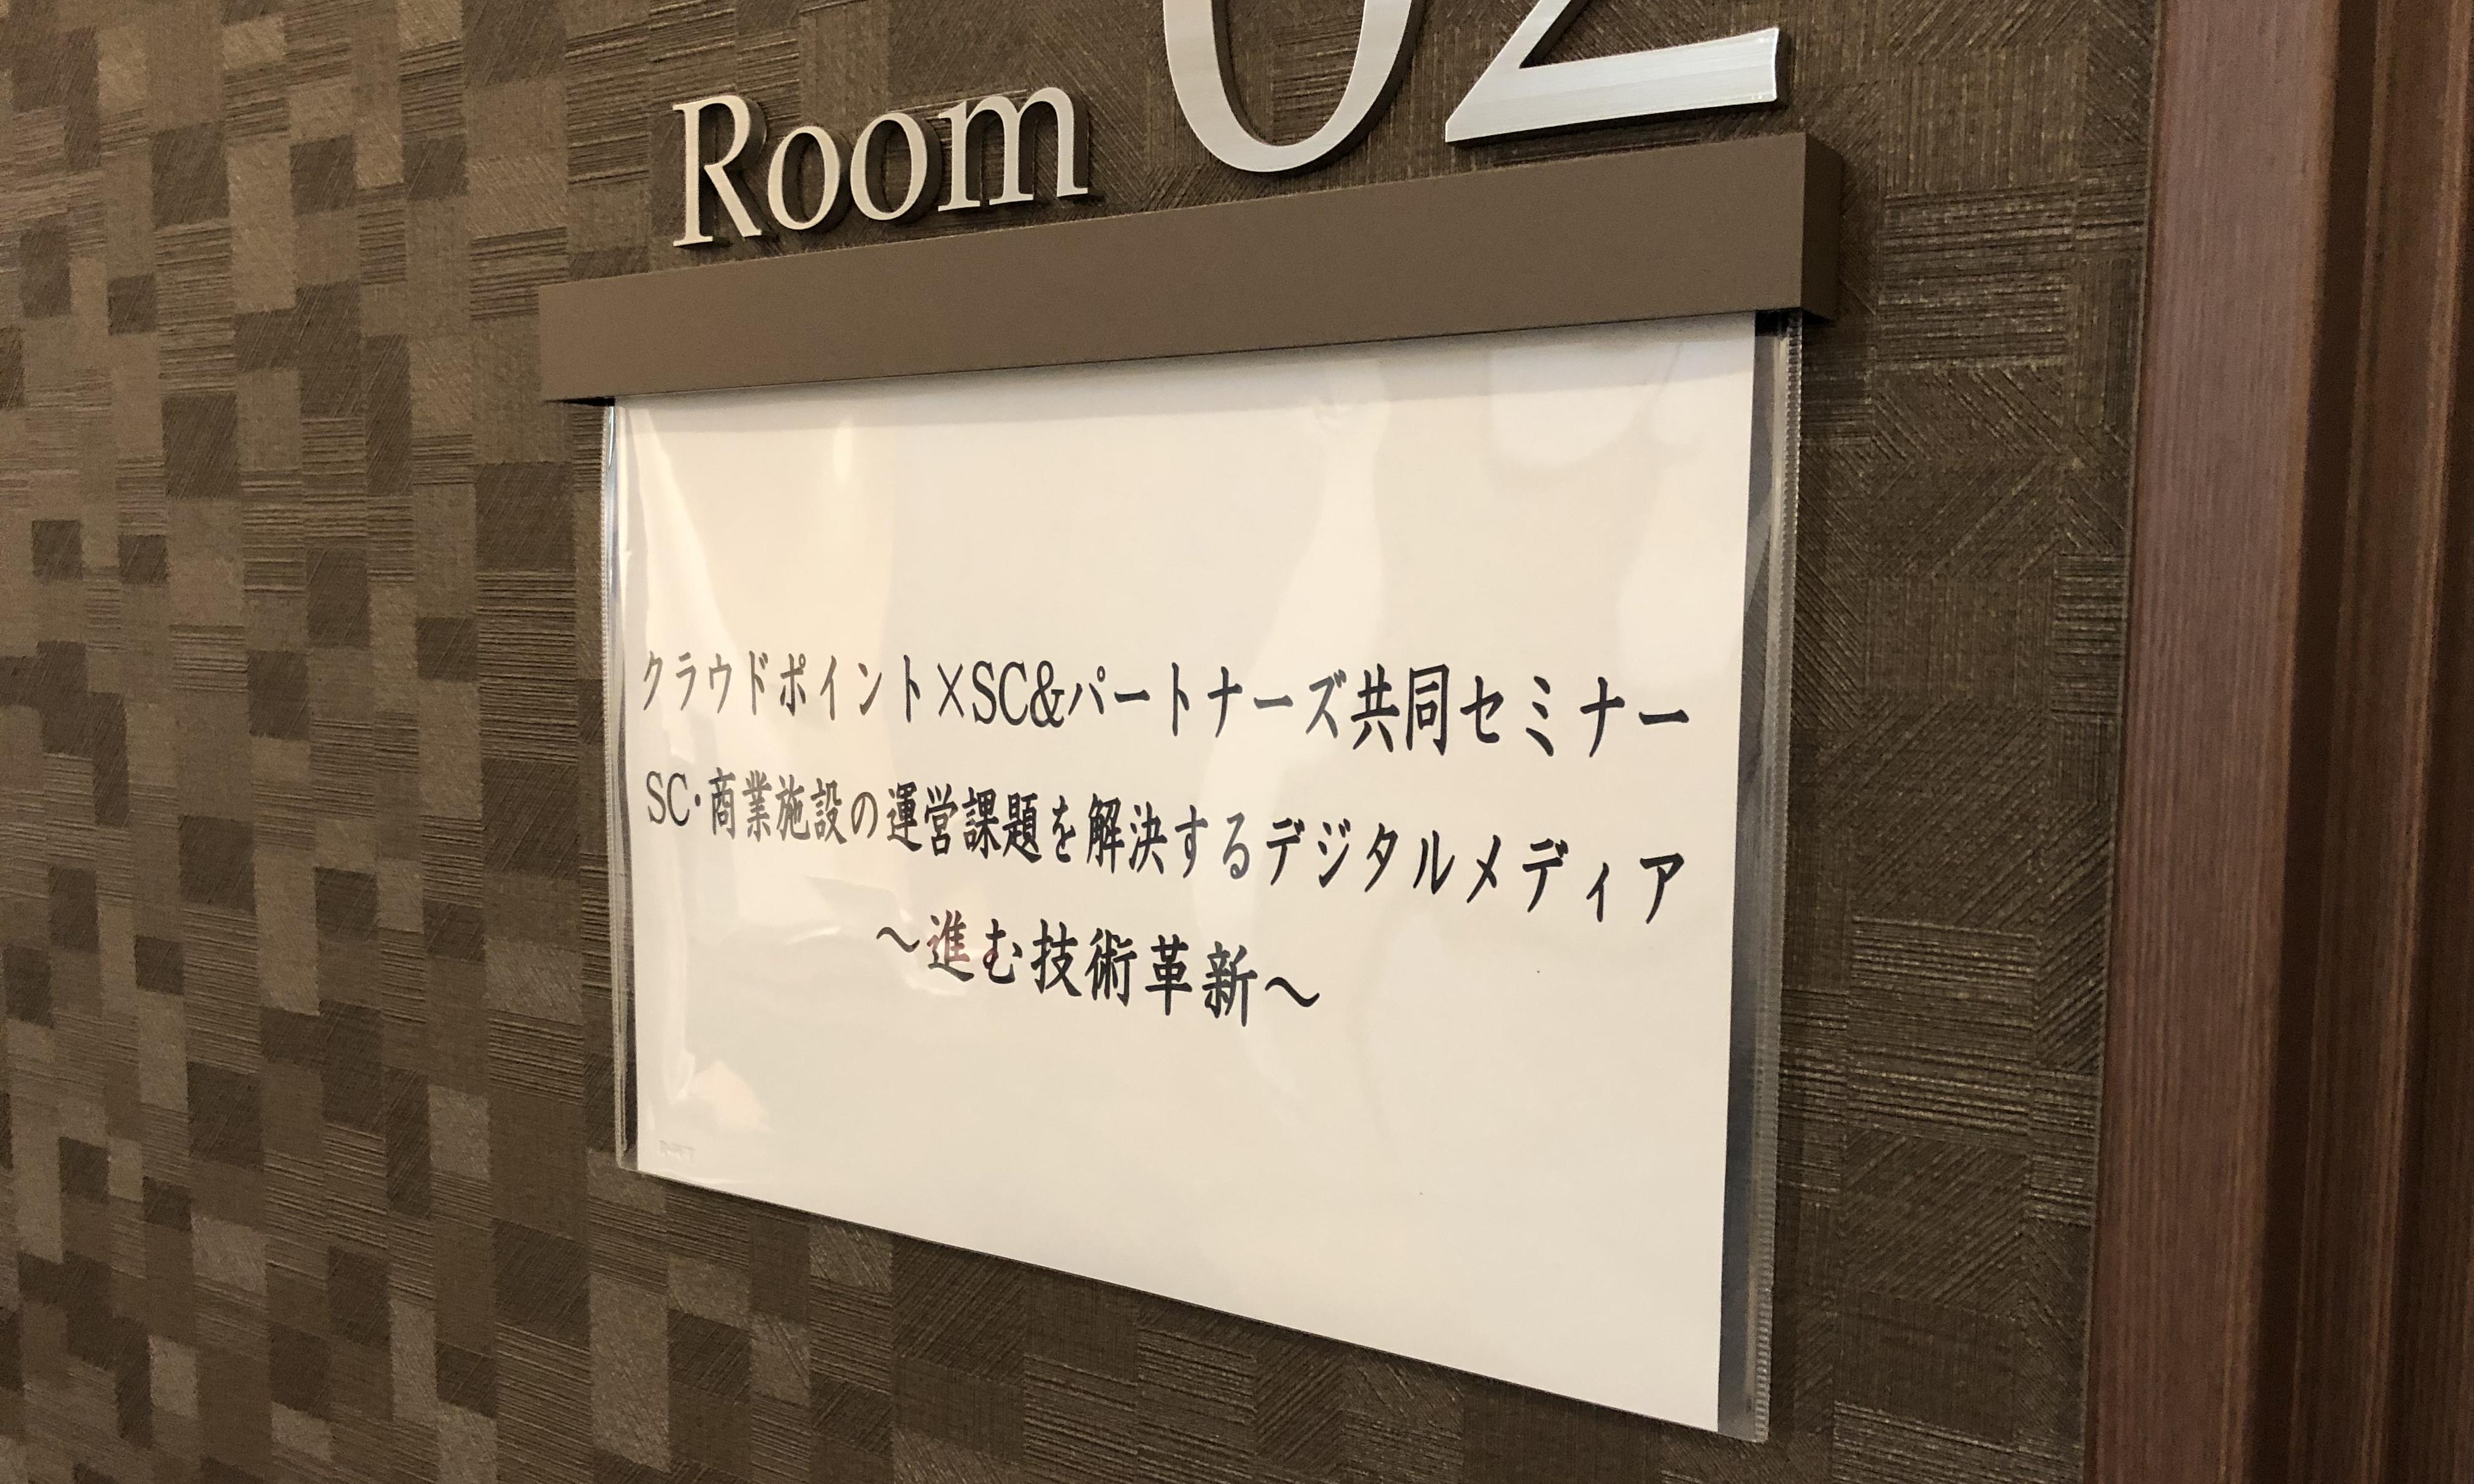 SC業界向けセミナー『SC・商業施設の運営課題を解決するデジタルメディア~進む技術革新』を大阪にて開催いたしました!